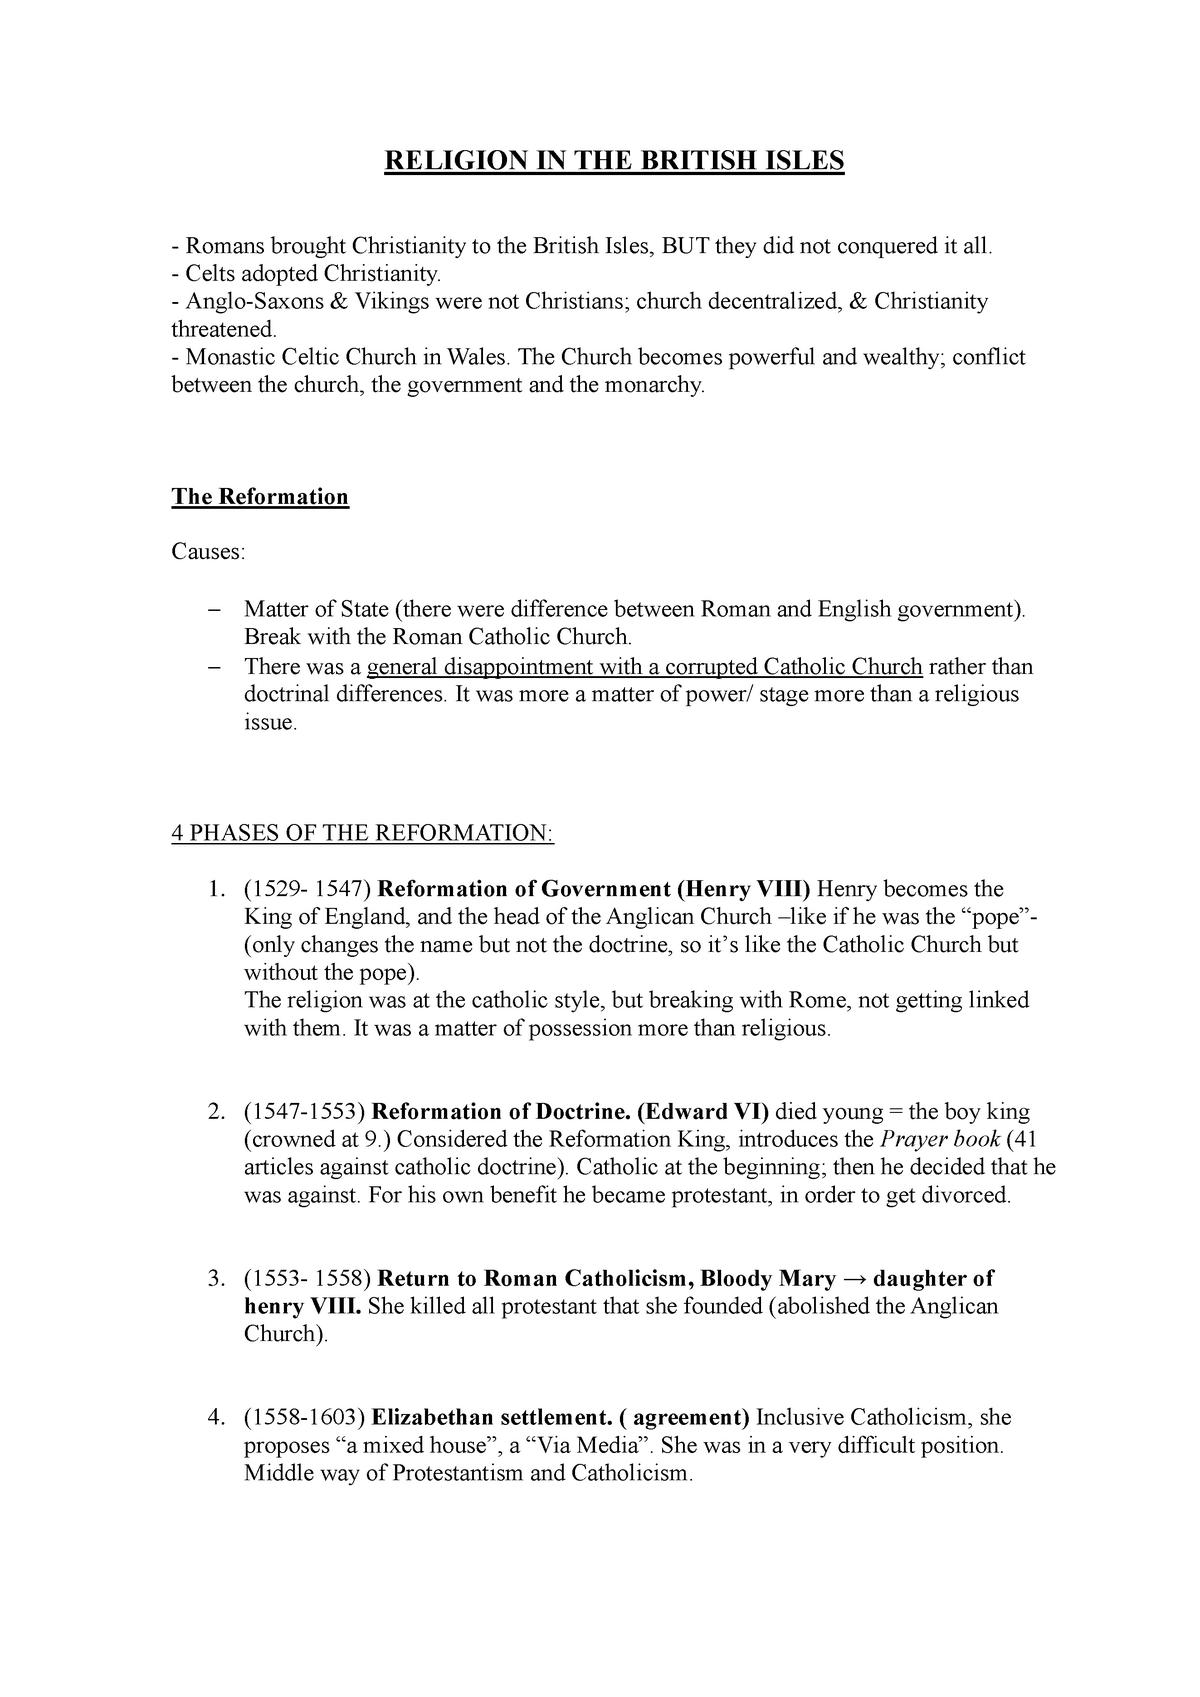 RELIGION IN THE BRITISH ISLES - Història i Cultures de les